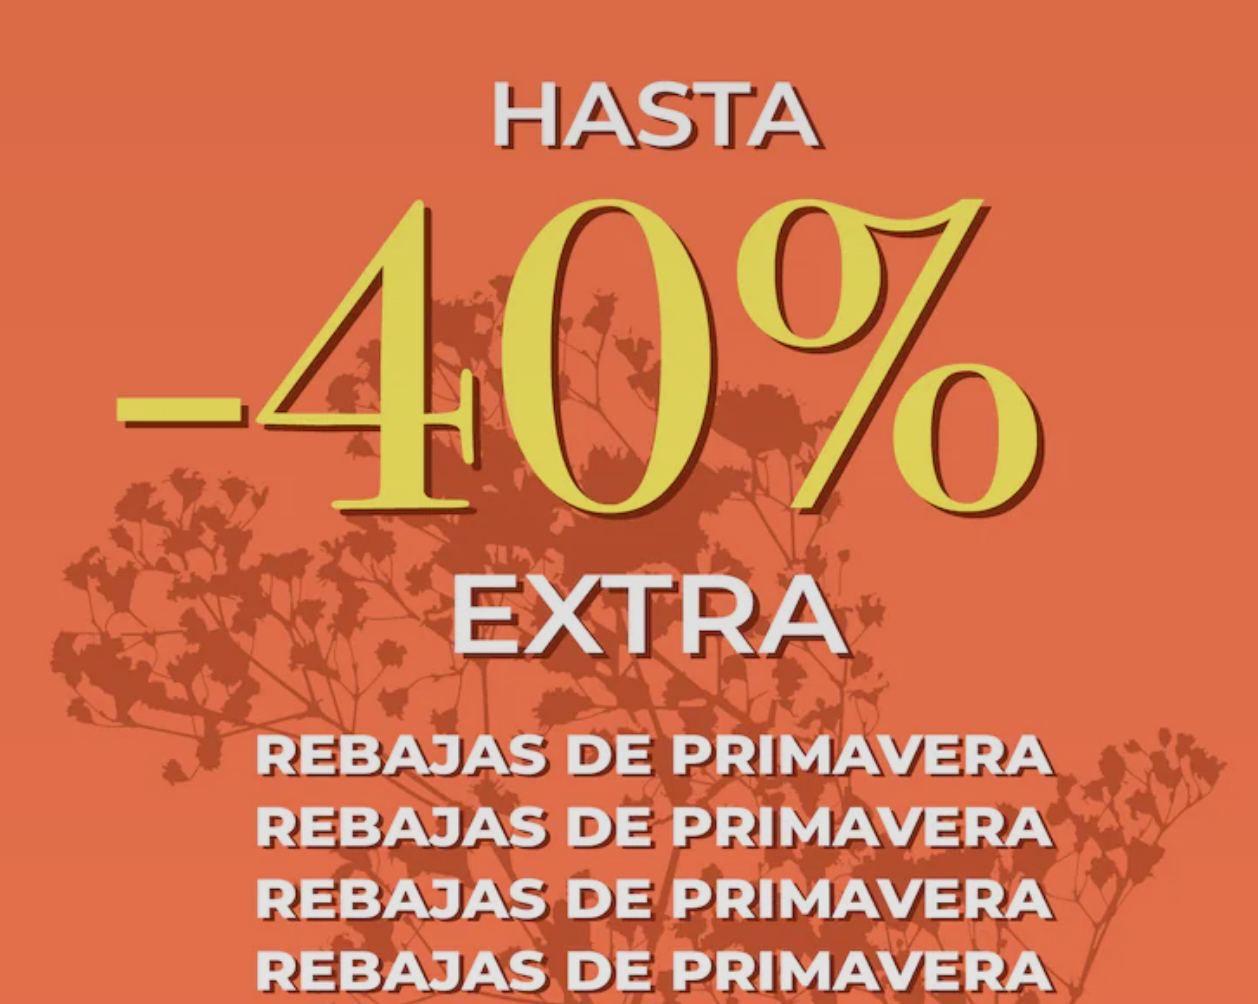 REBAJAS PRIMAVERA [-40% EXTRA]